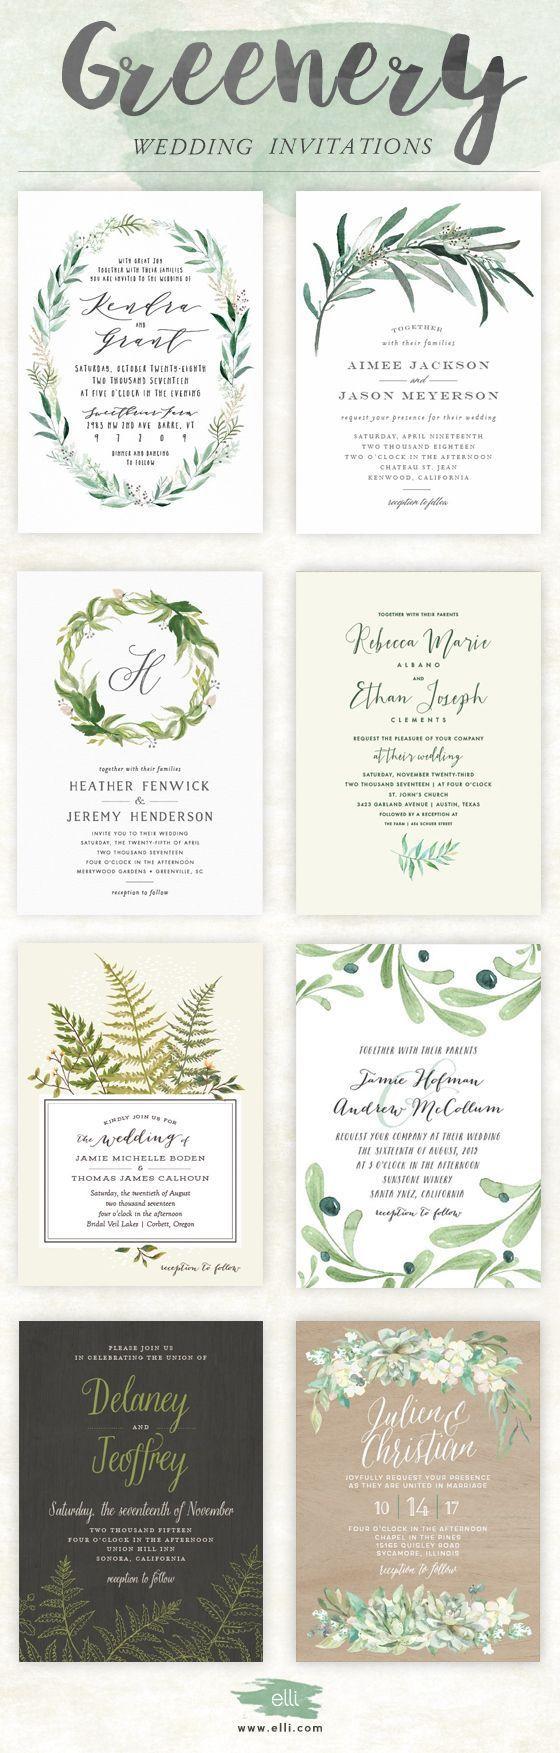 Trending for 2017 - greenery wedding invitations from http://Elli.com